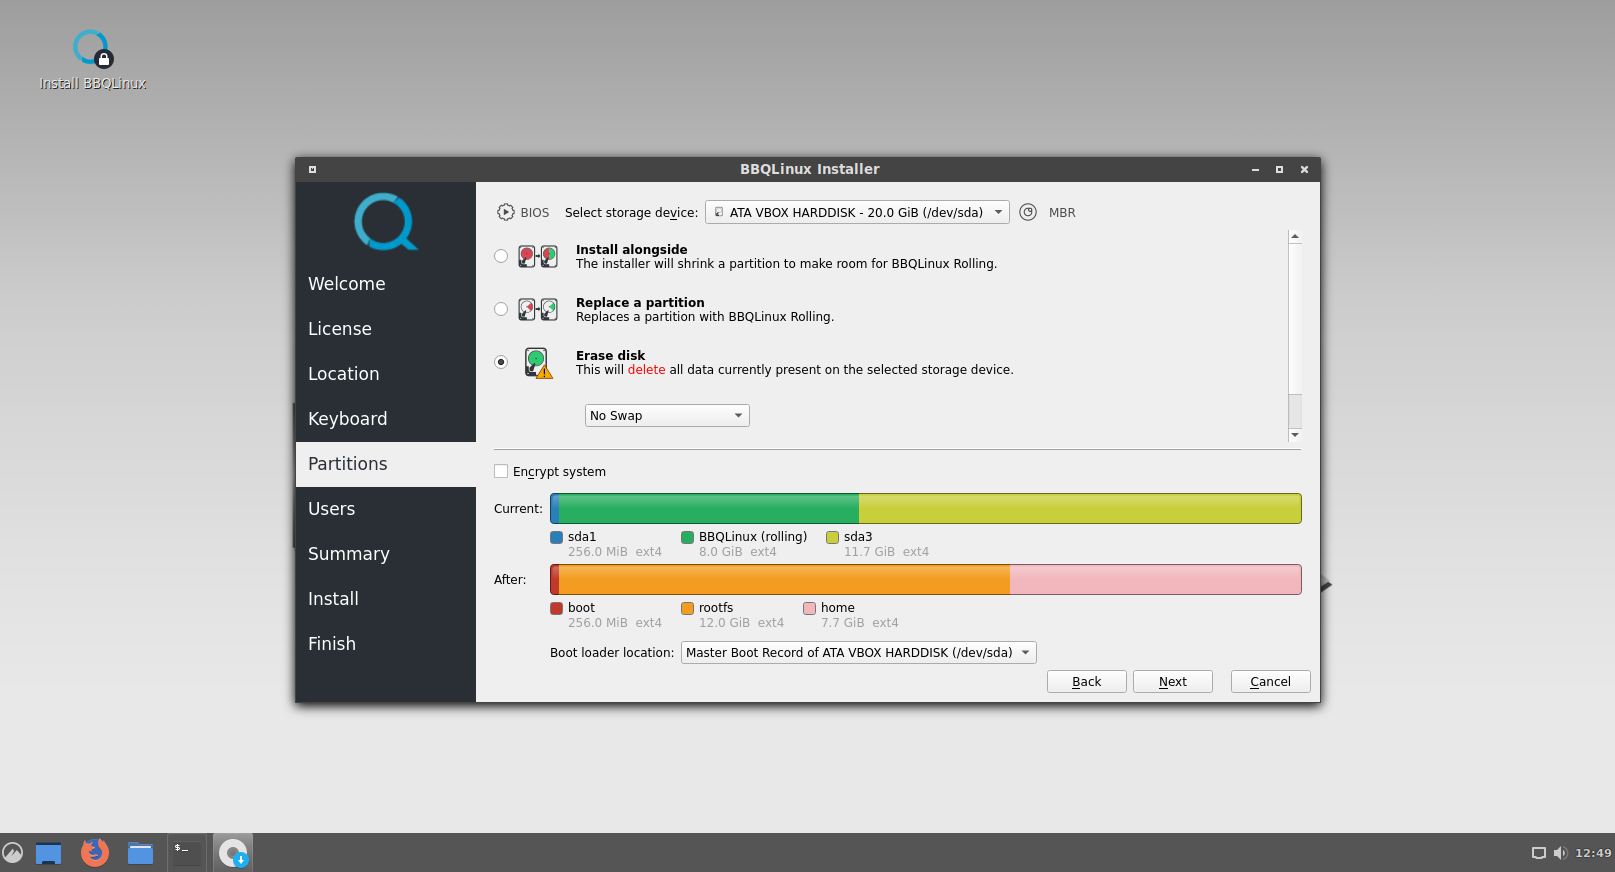 bbqlinux_installer.png